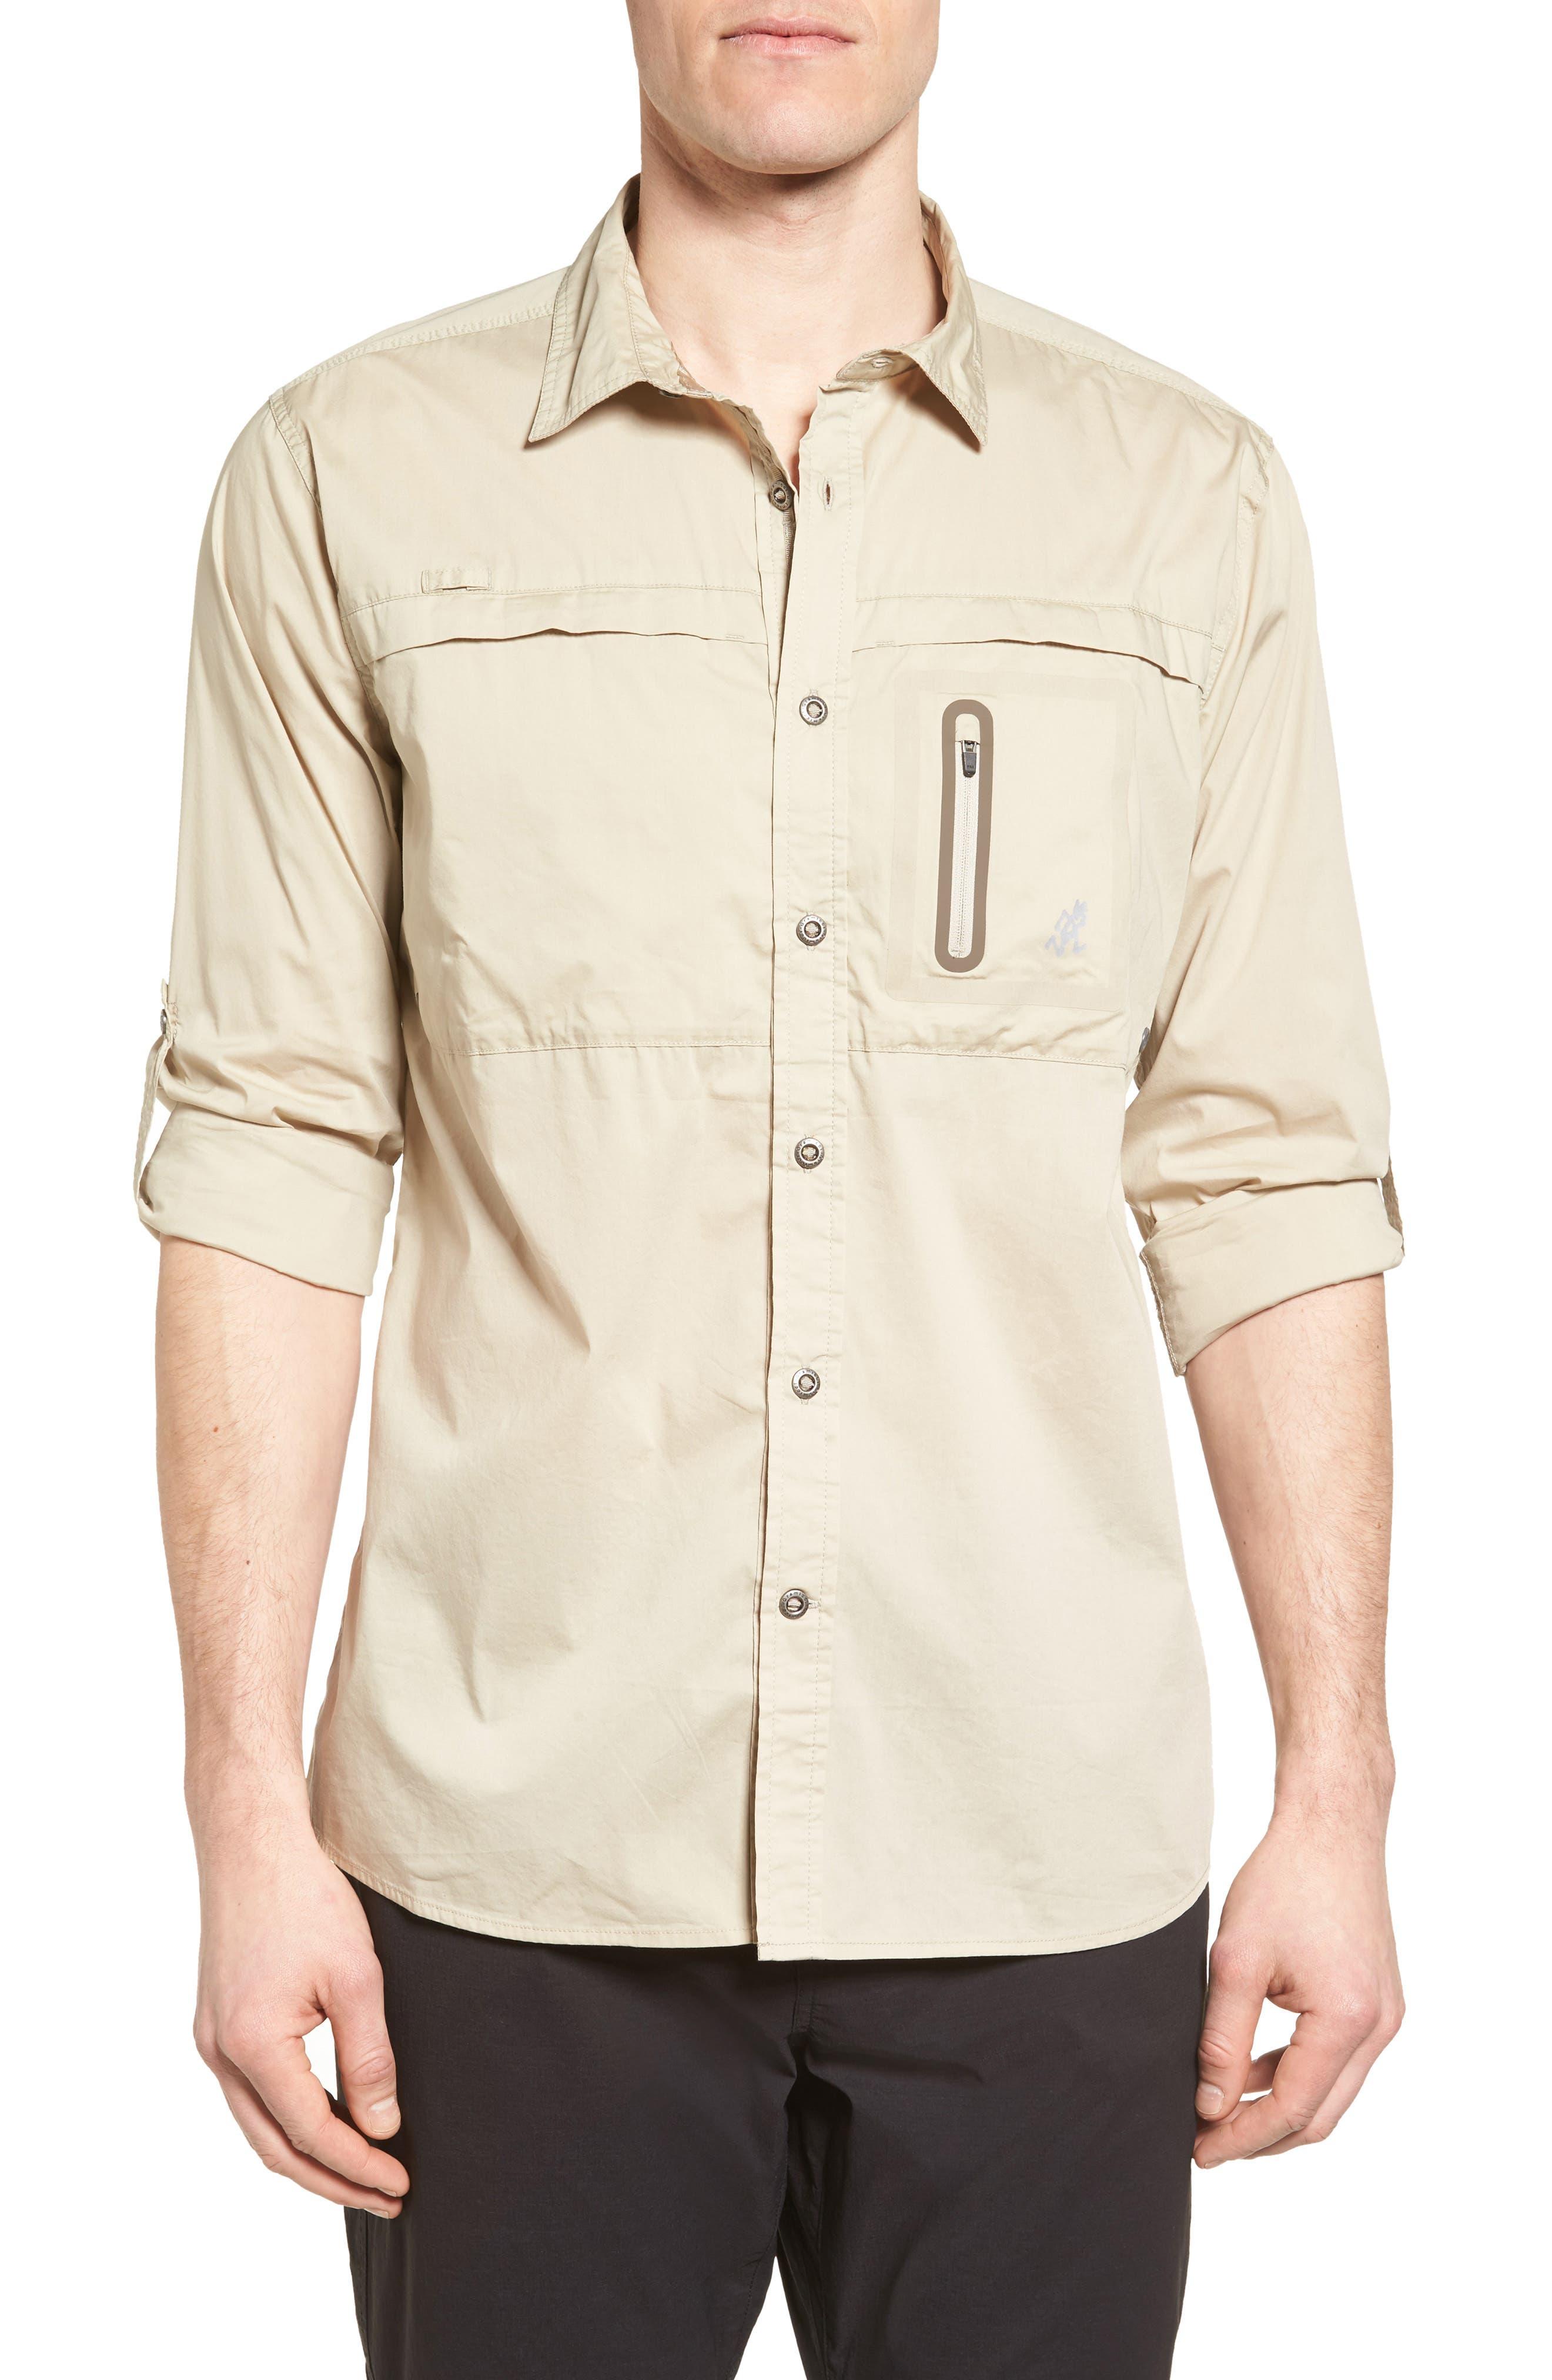 NO-Squito Regular Fit Travel Shirt,                             Main thumbnail 1, color,                             True Khaki